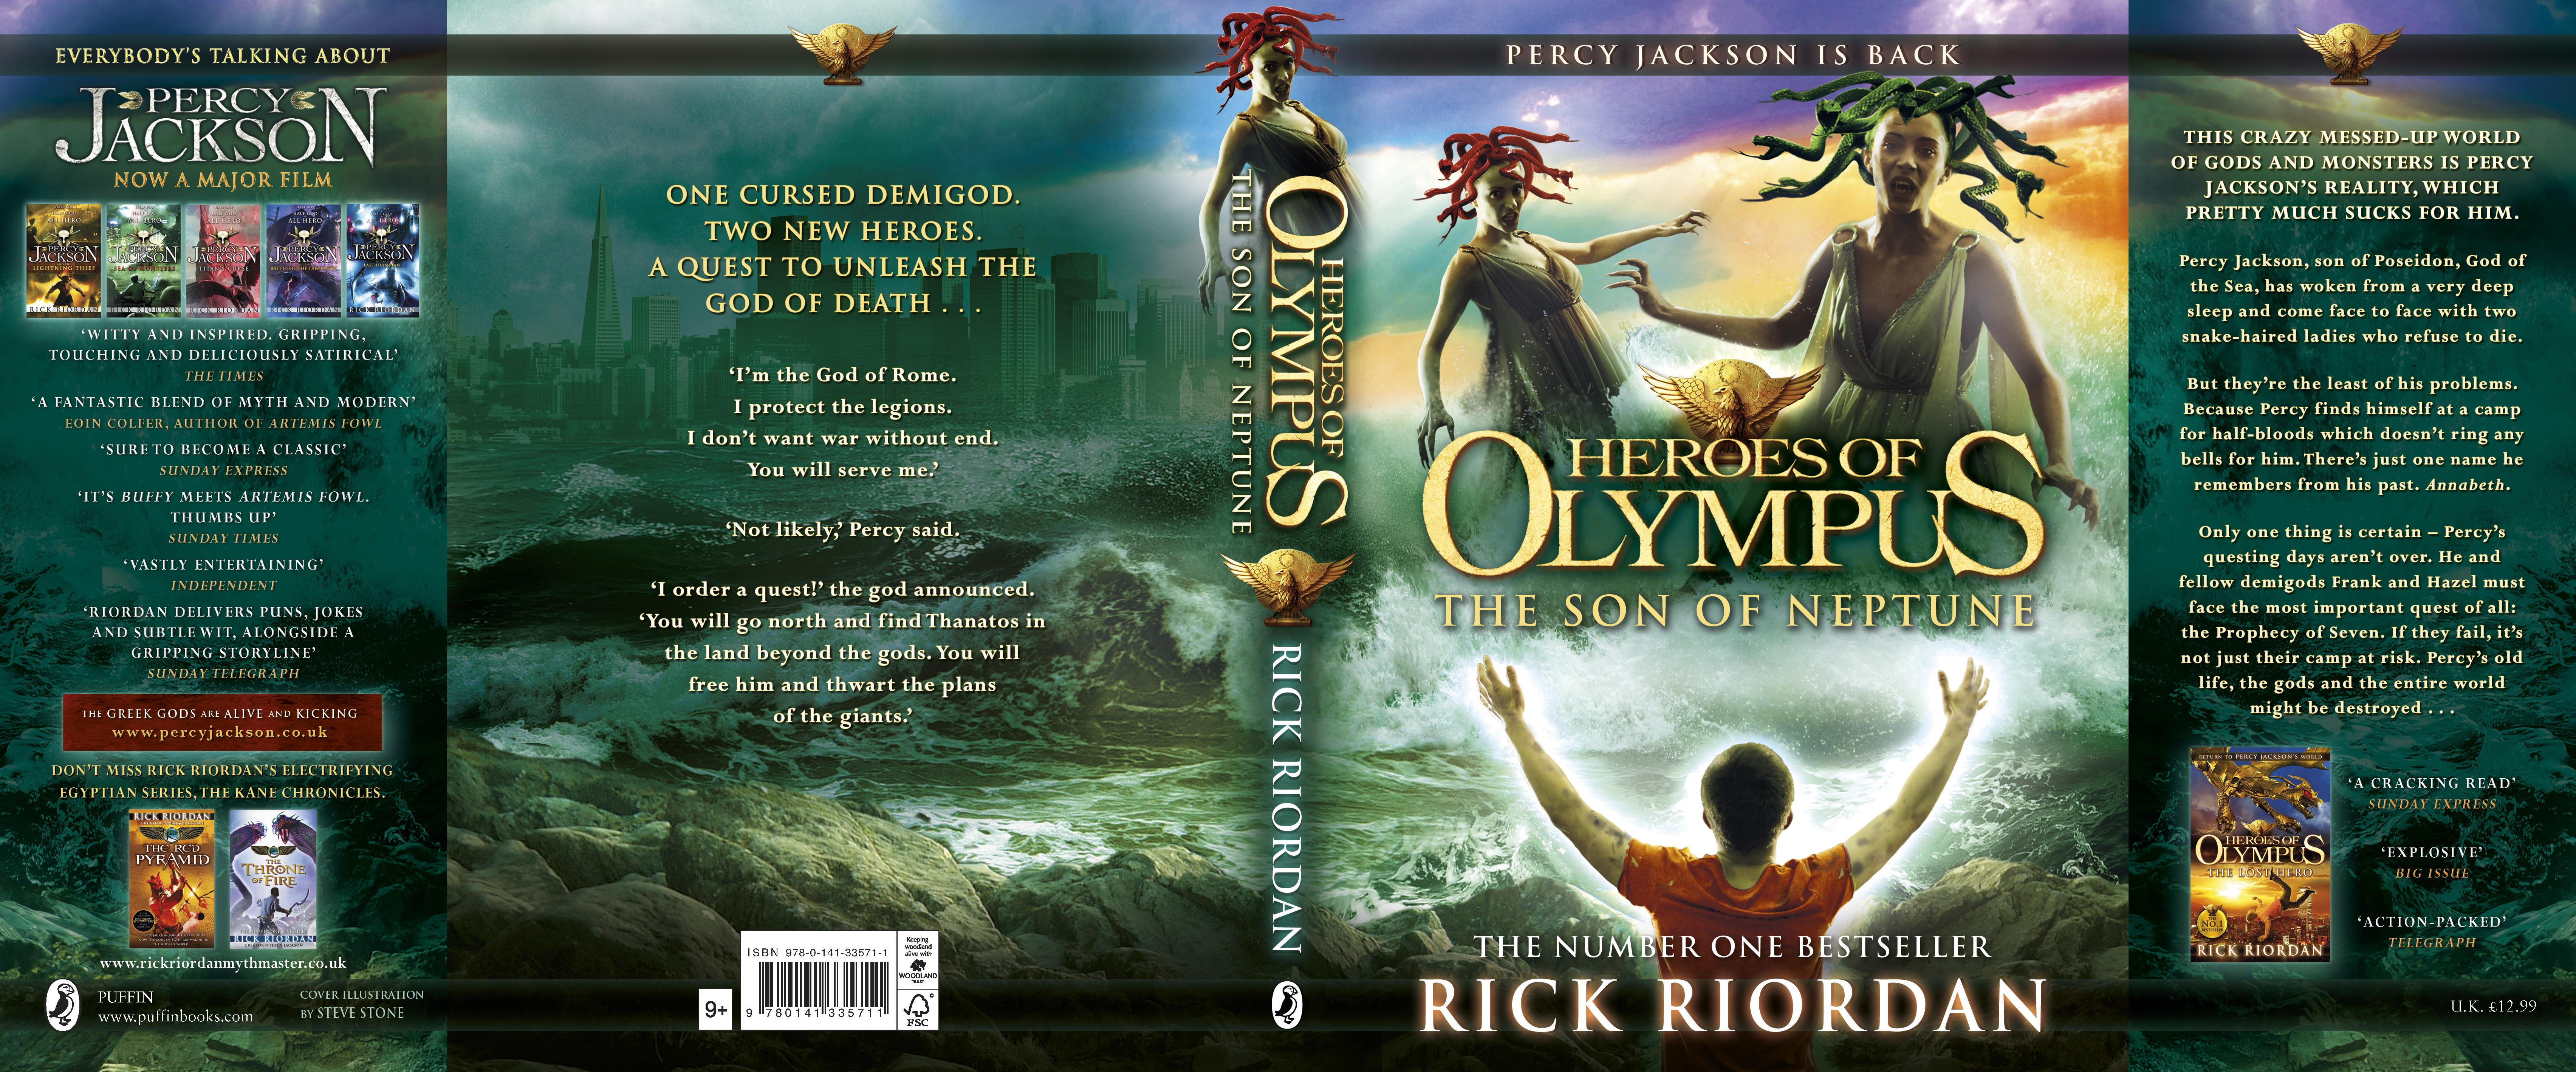 Heroes of Olympus The Son of Neptune